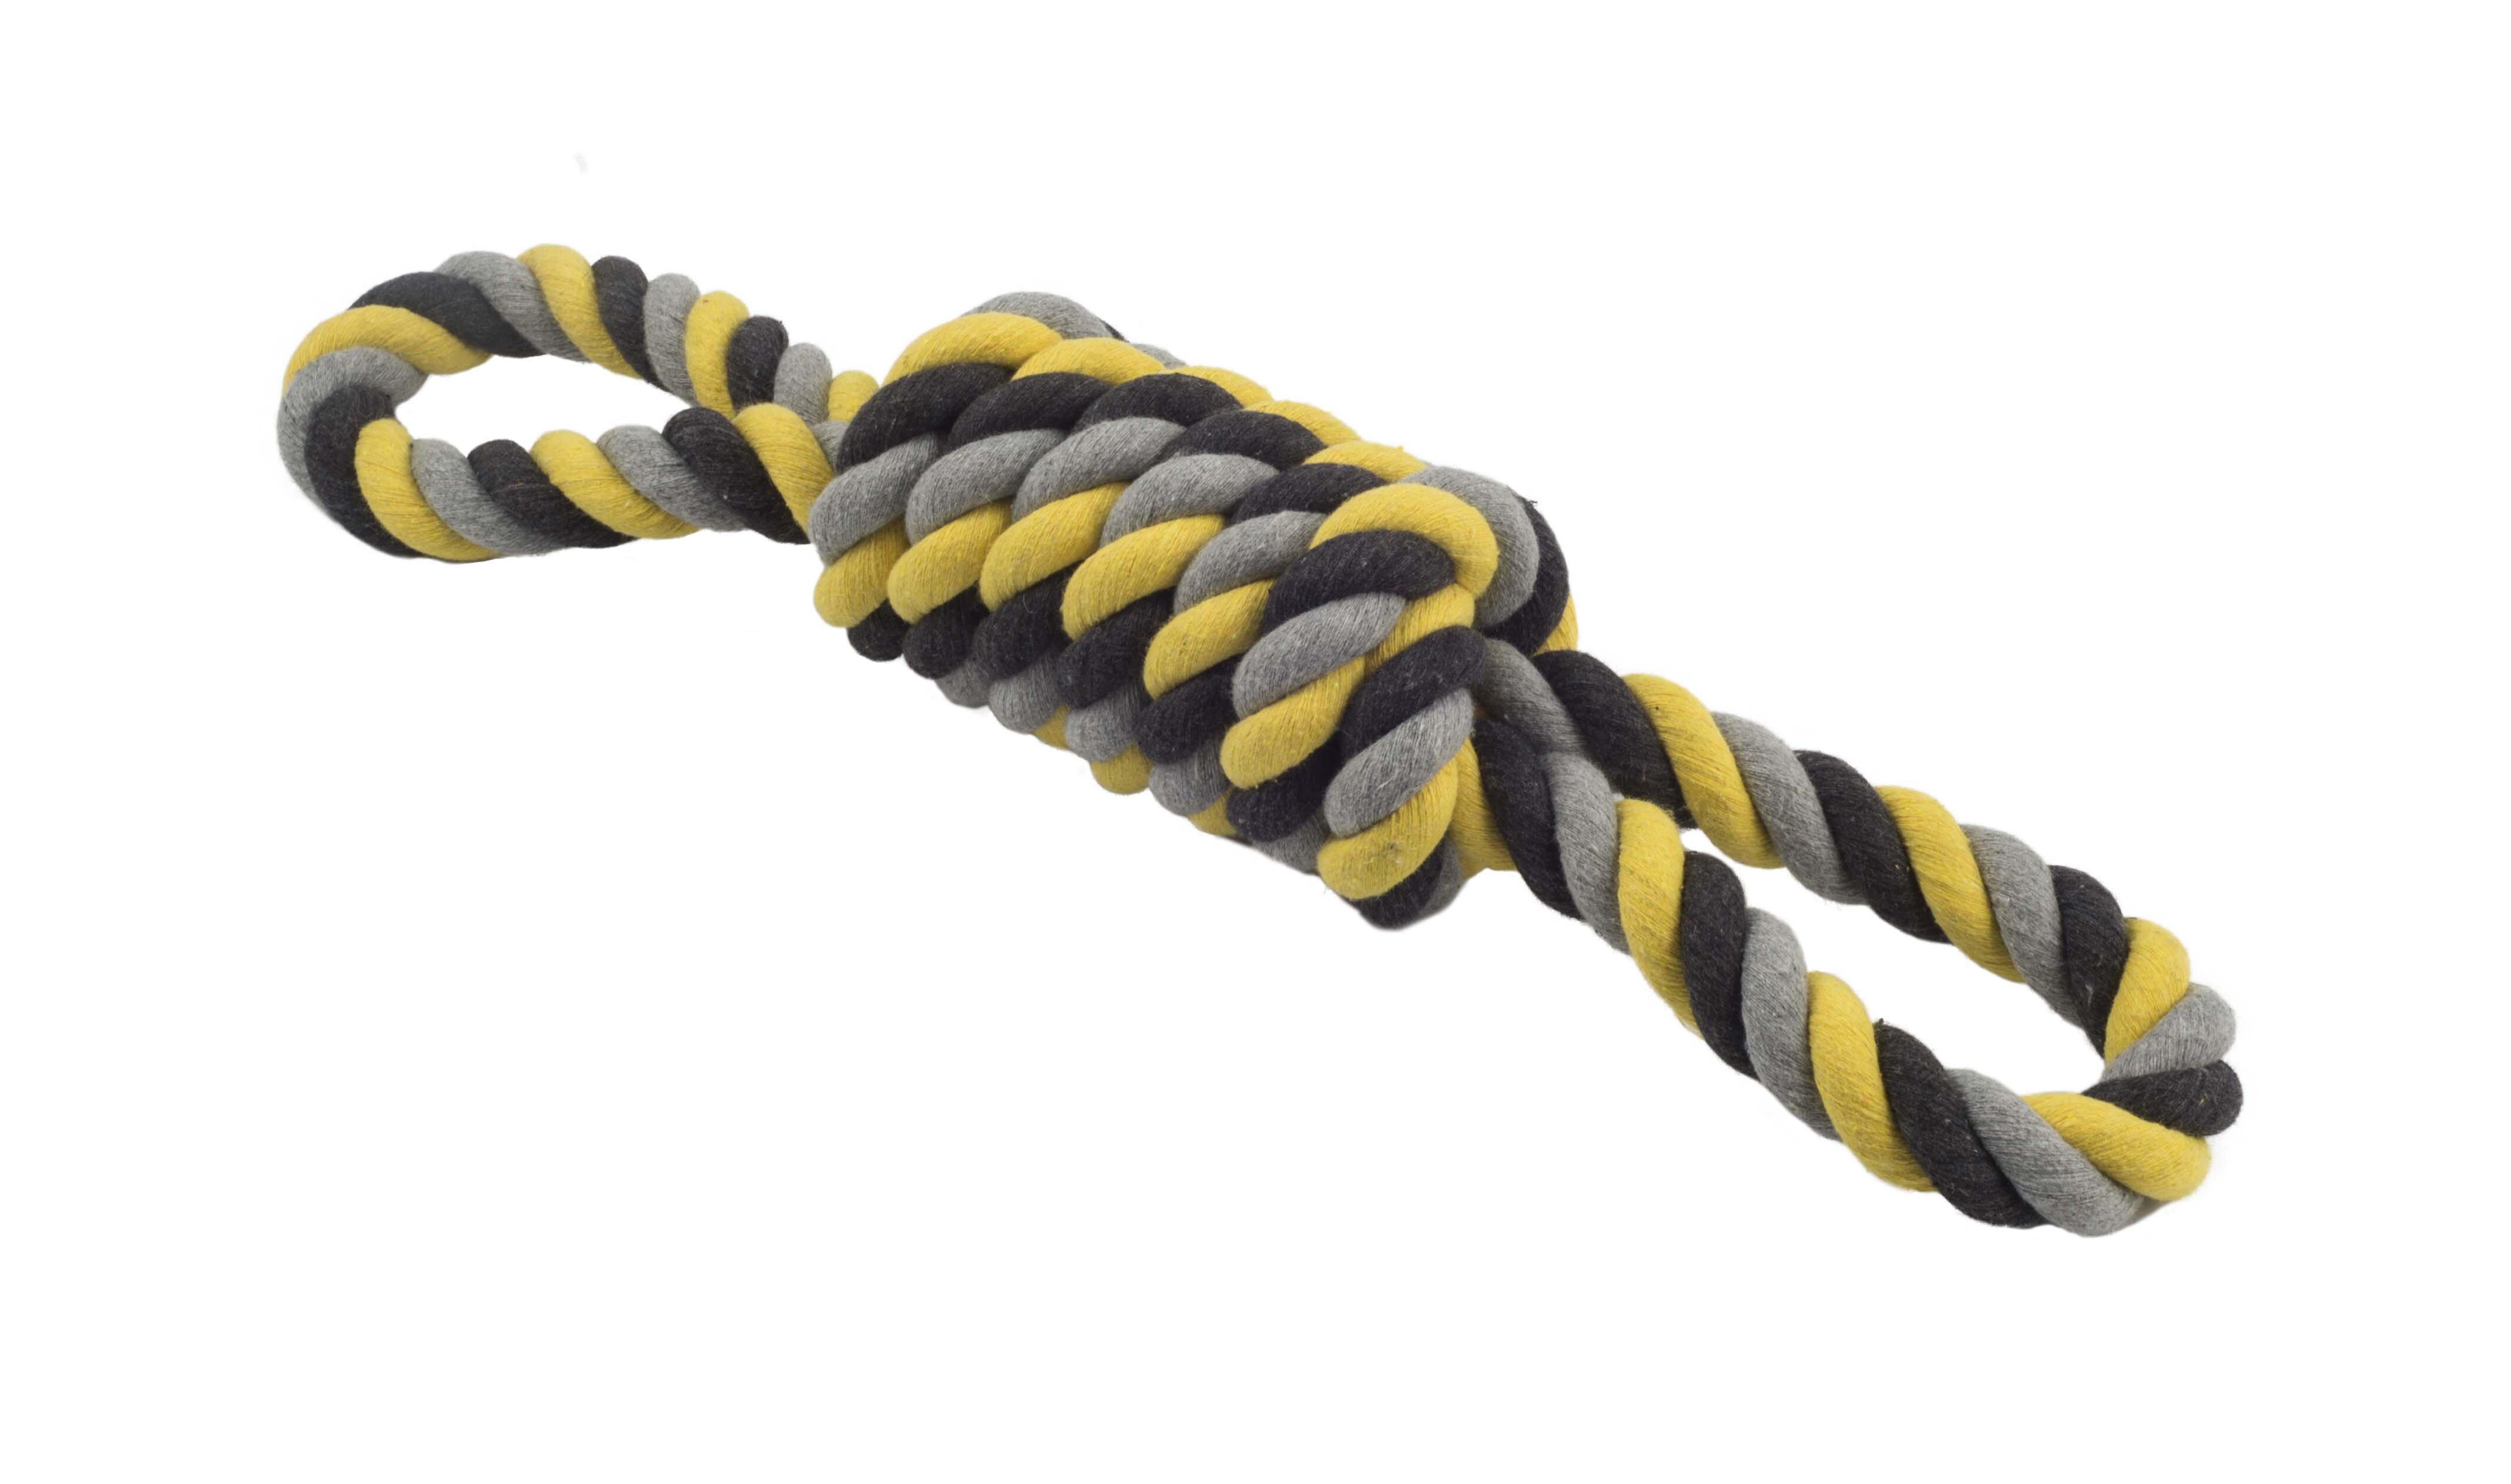 Ancol Jumbo Jaws Rope Log Coil Tugger 53cm x 1